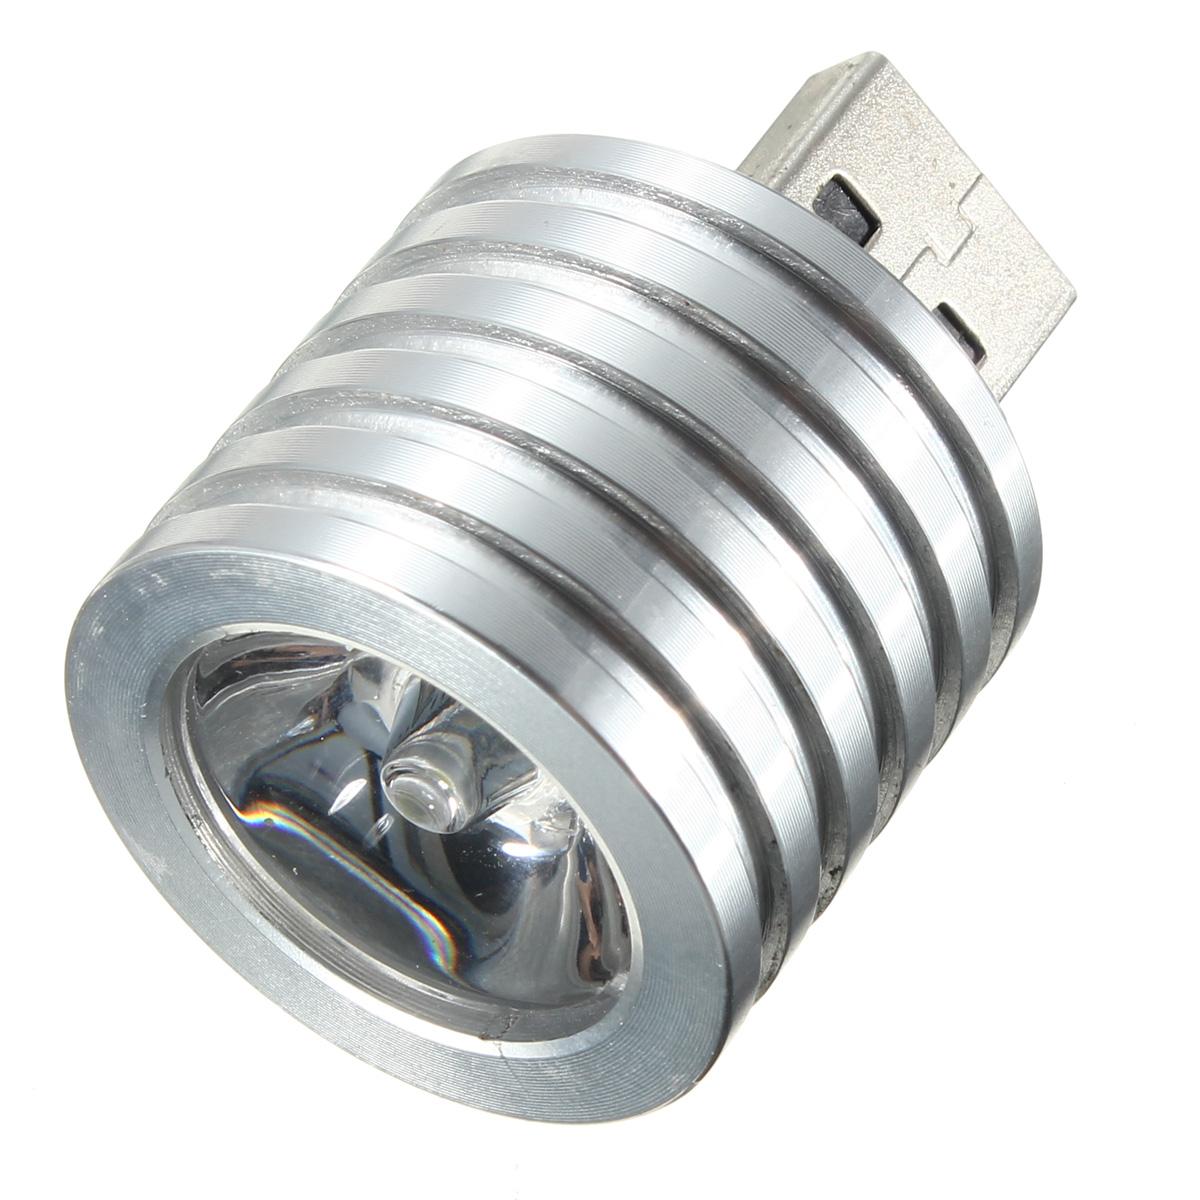 hot 2w portable mini usb led spotlight lamp mobile power flashlight night light ebay. Black Bedroom Furniture Sets. Home Design Ideas